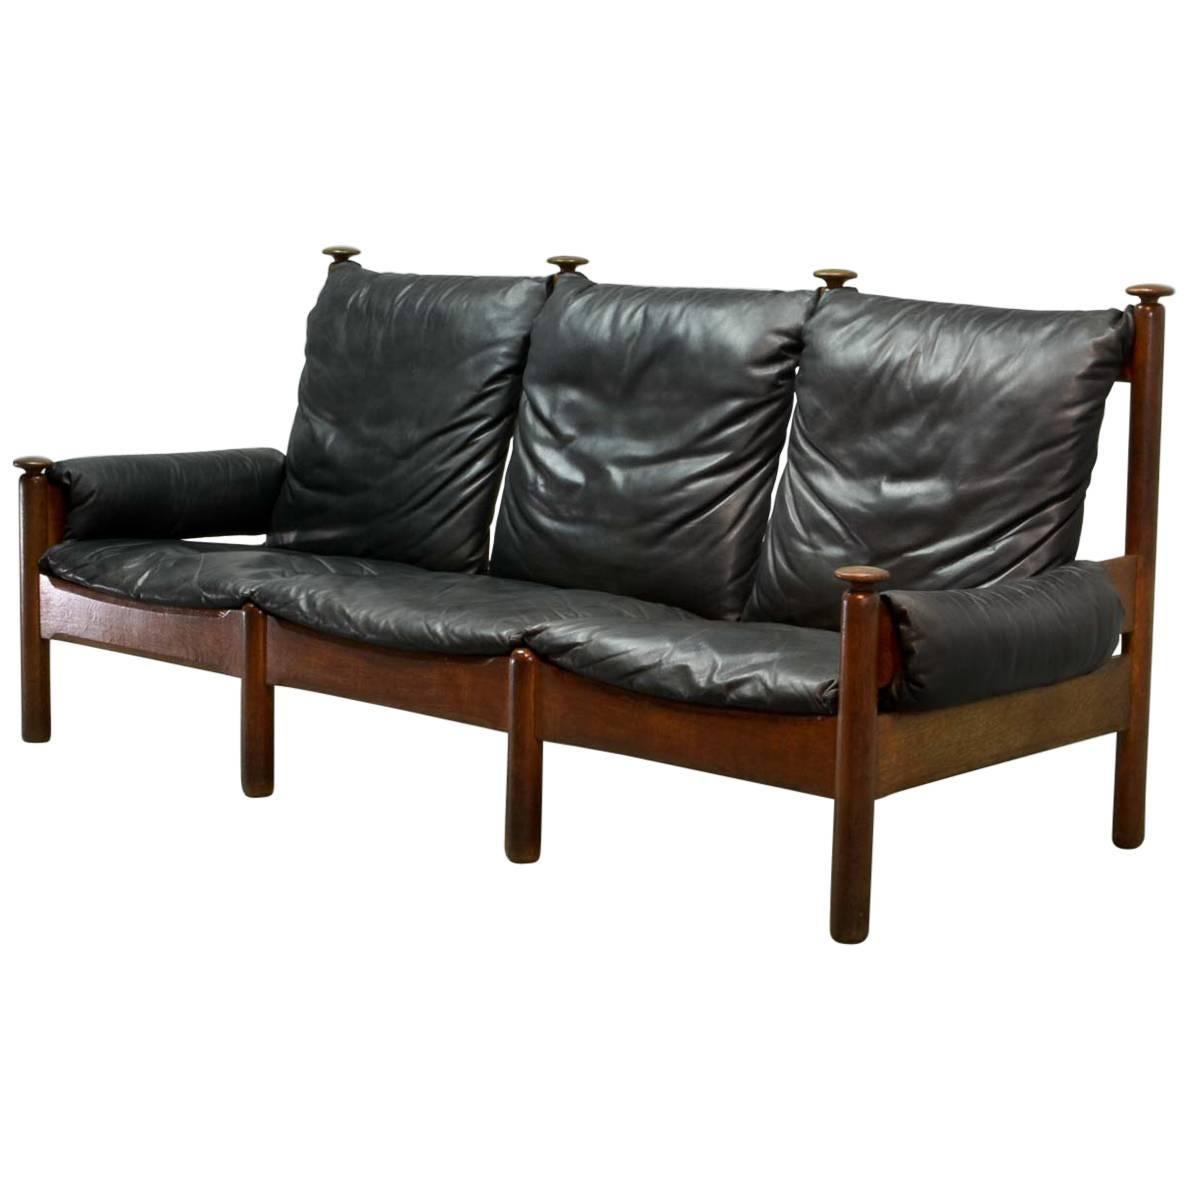 sturdy midcentury black leather threeseat sofa 1960s